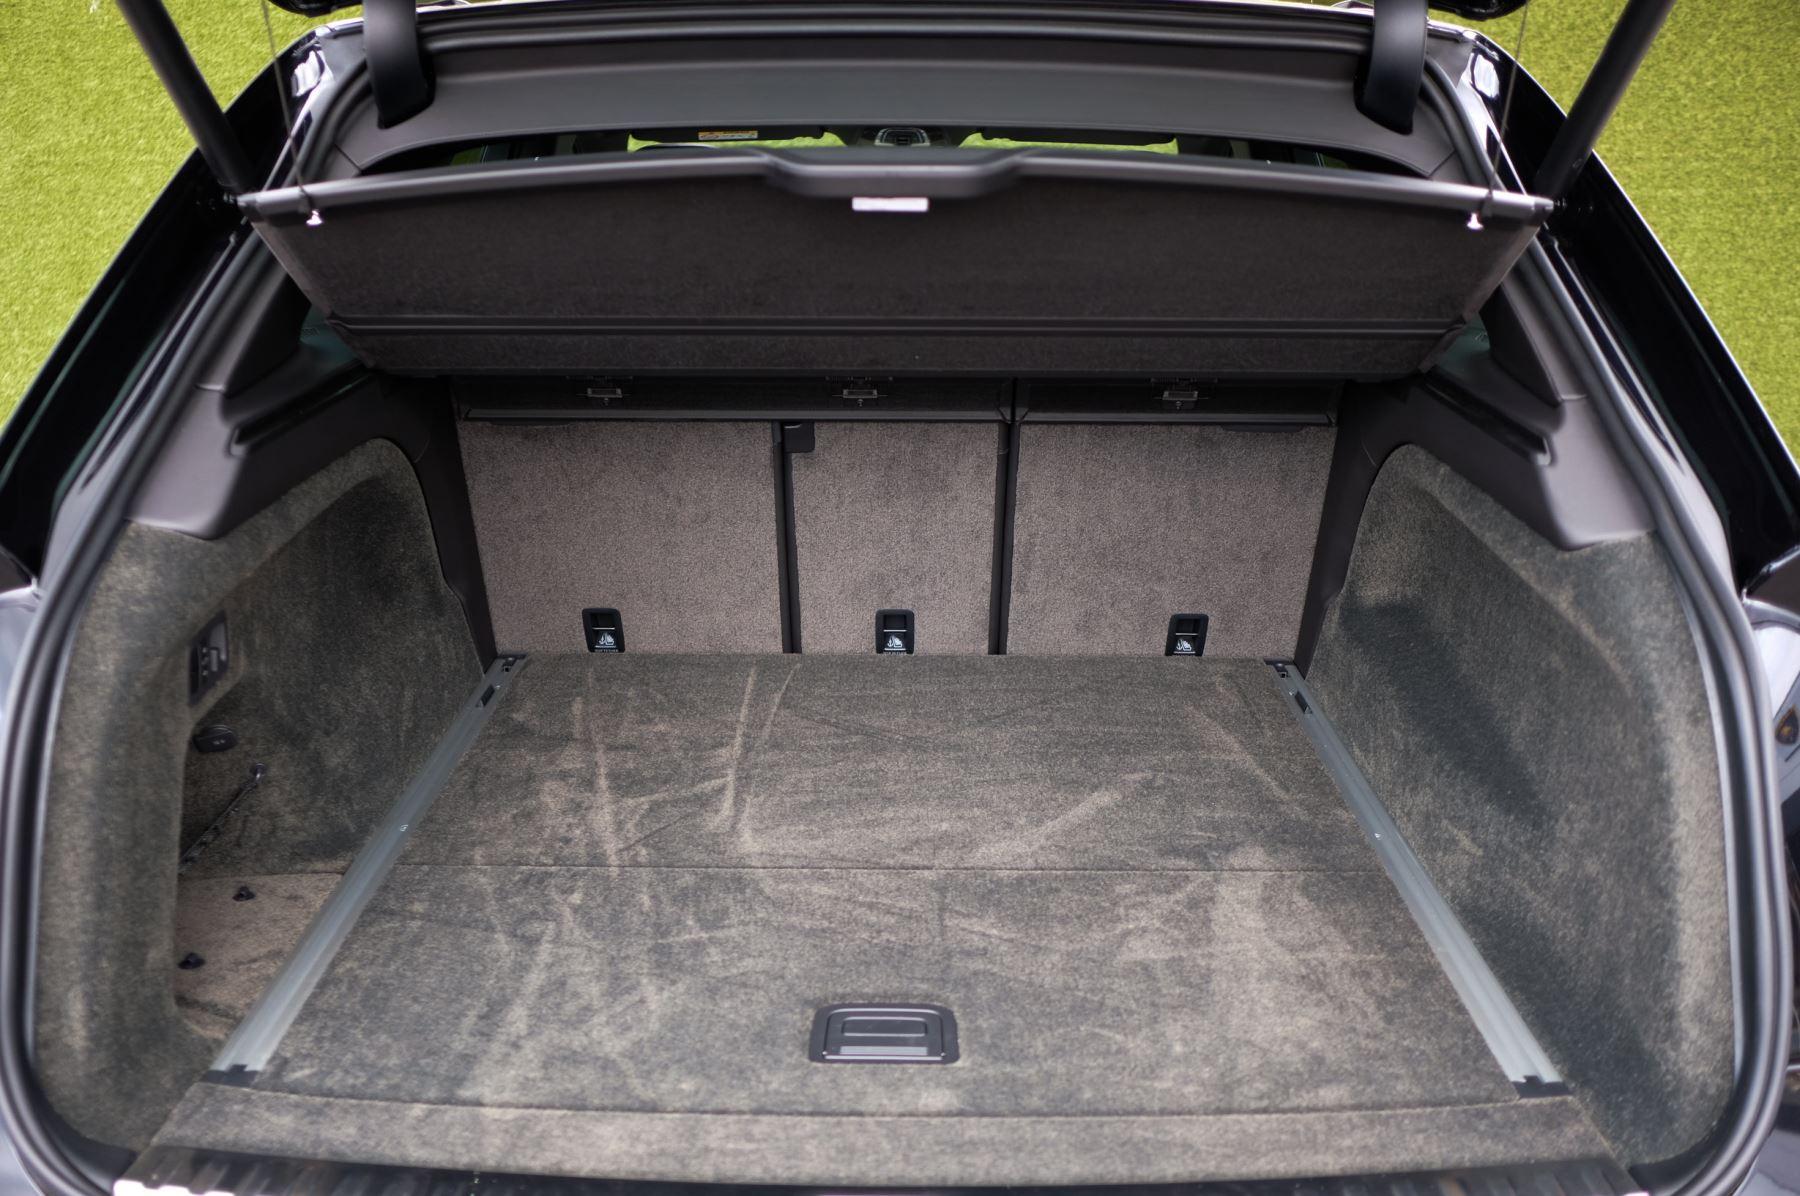 Bentley Bentayga 4.0 V8 - Mulliner Driving Specification for Black Specification image 10